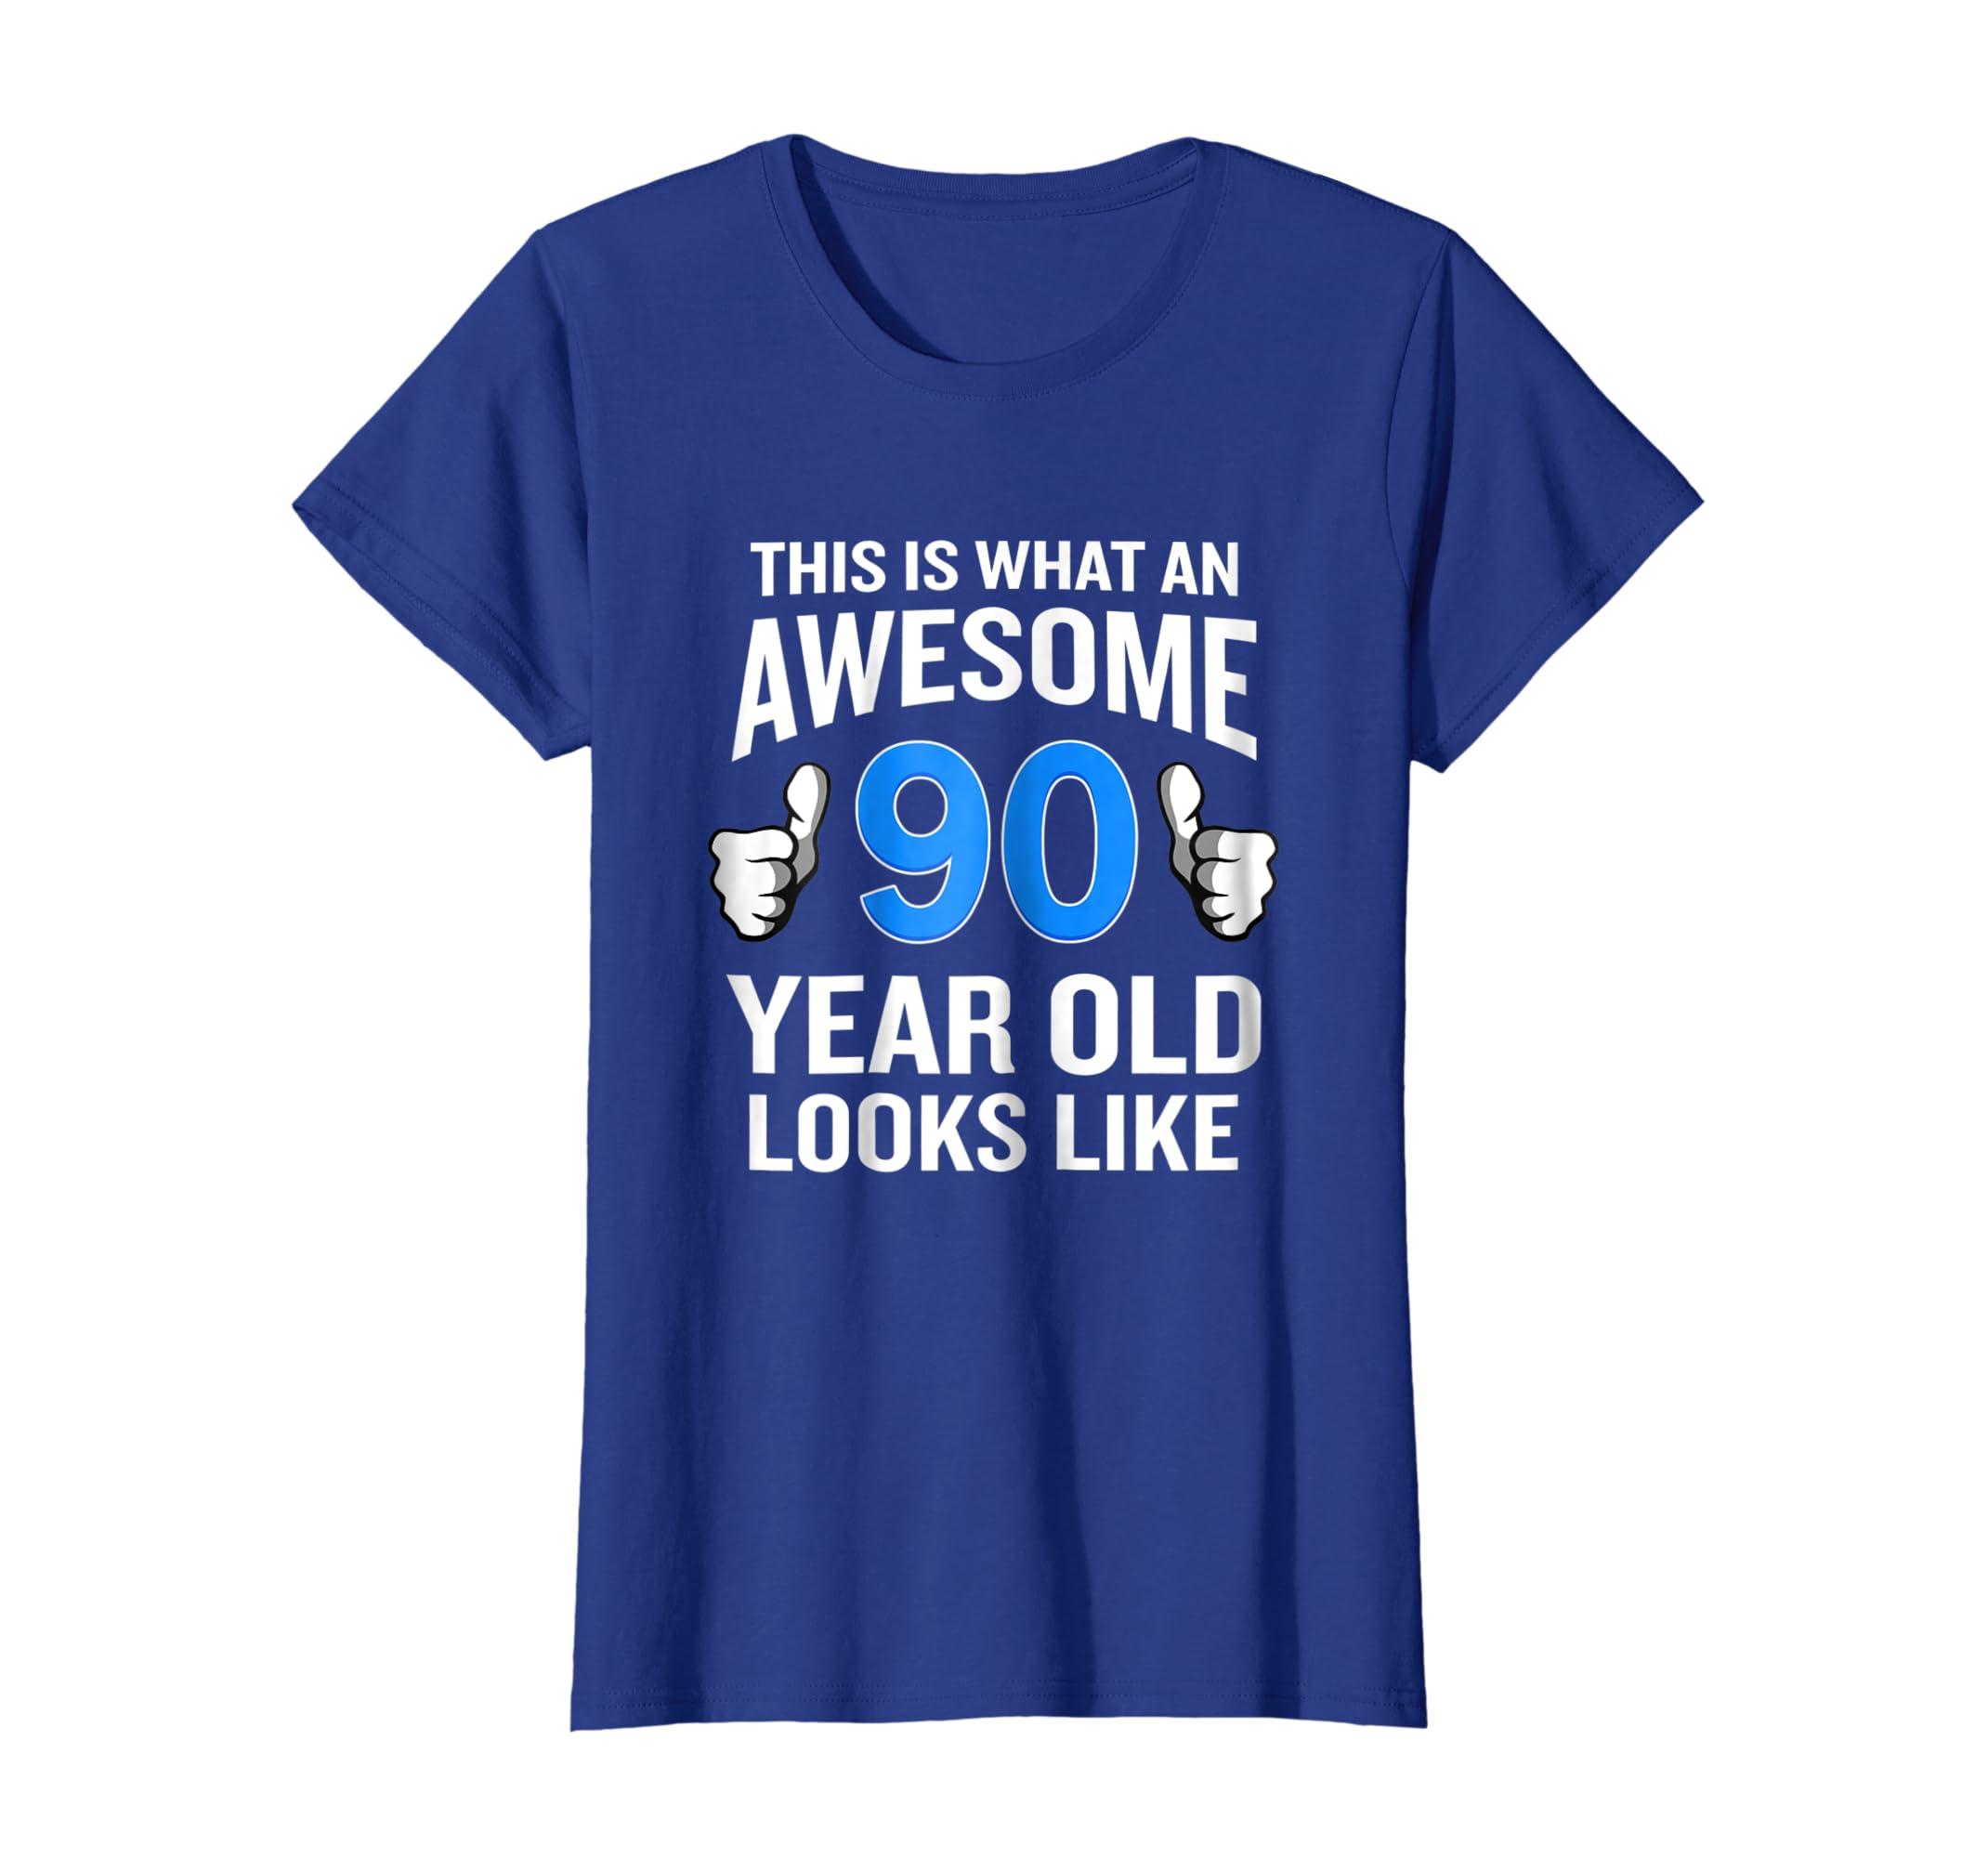 Amazon 90 Year Old Birthday T Shirt Funny Senior Man Or Woman Gift Clothing